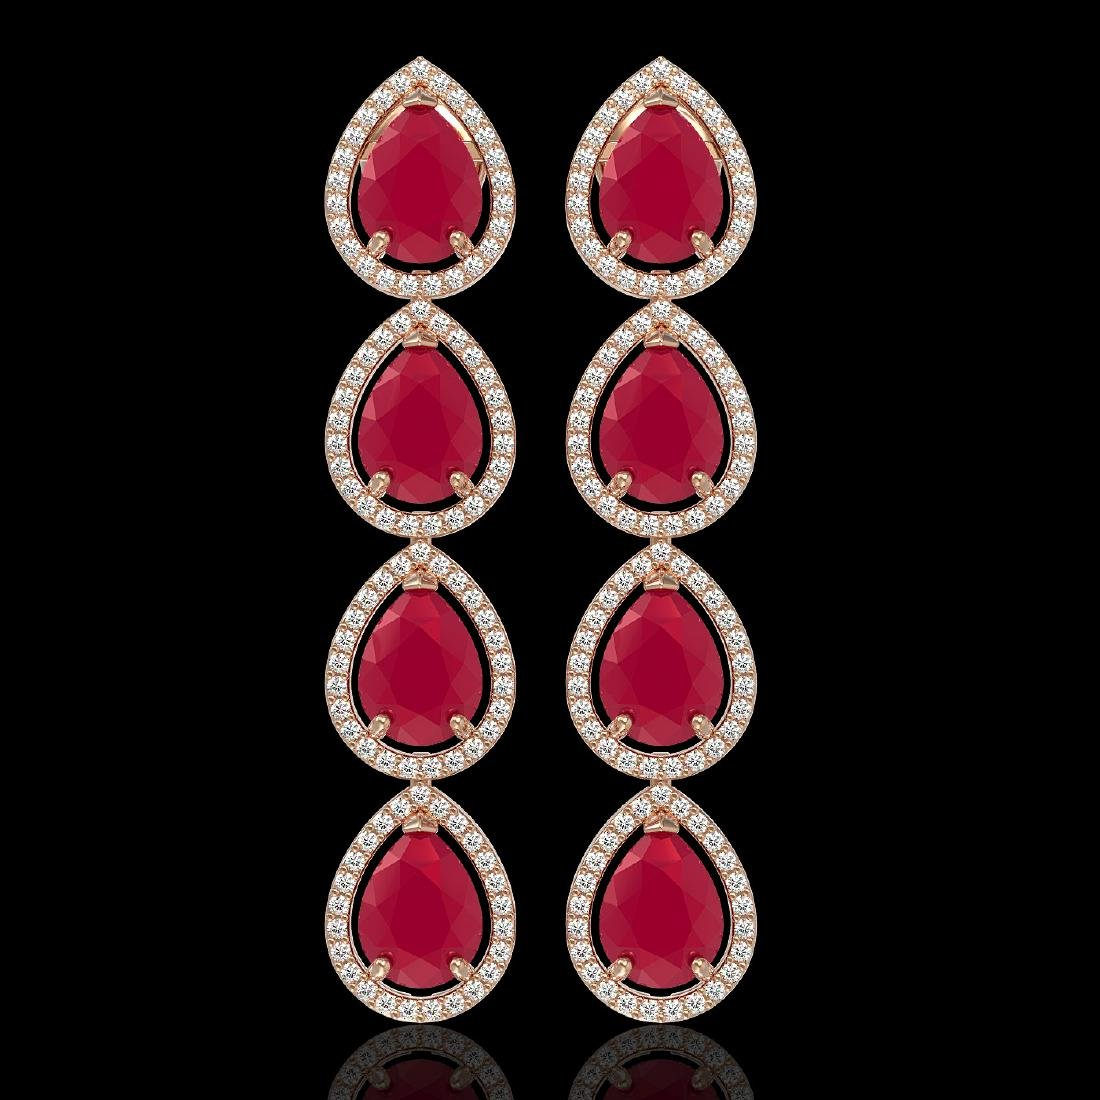 16.01 CTW Ruby & Diamond Halo Earrings 10K Rose Gold